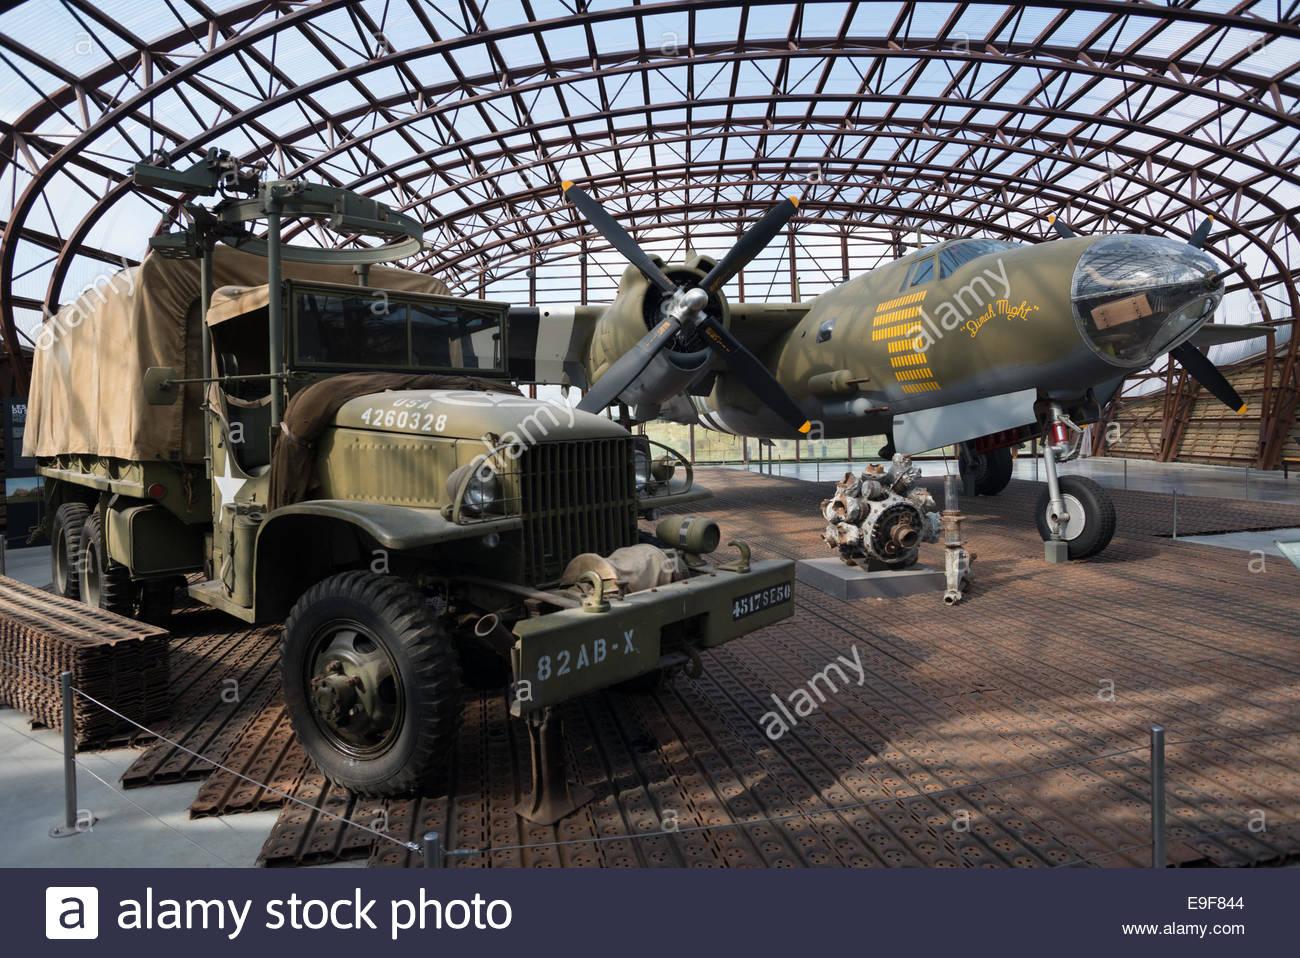 us-b-26-bomber-aircraft-utah-beach-landi